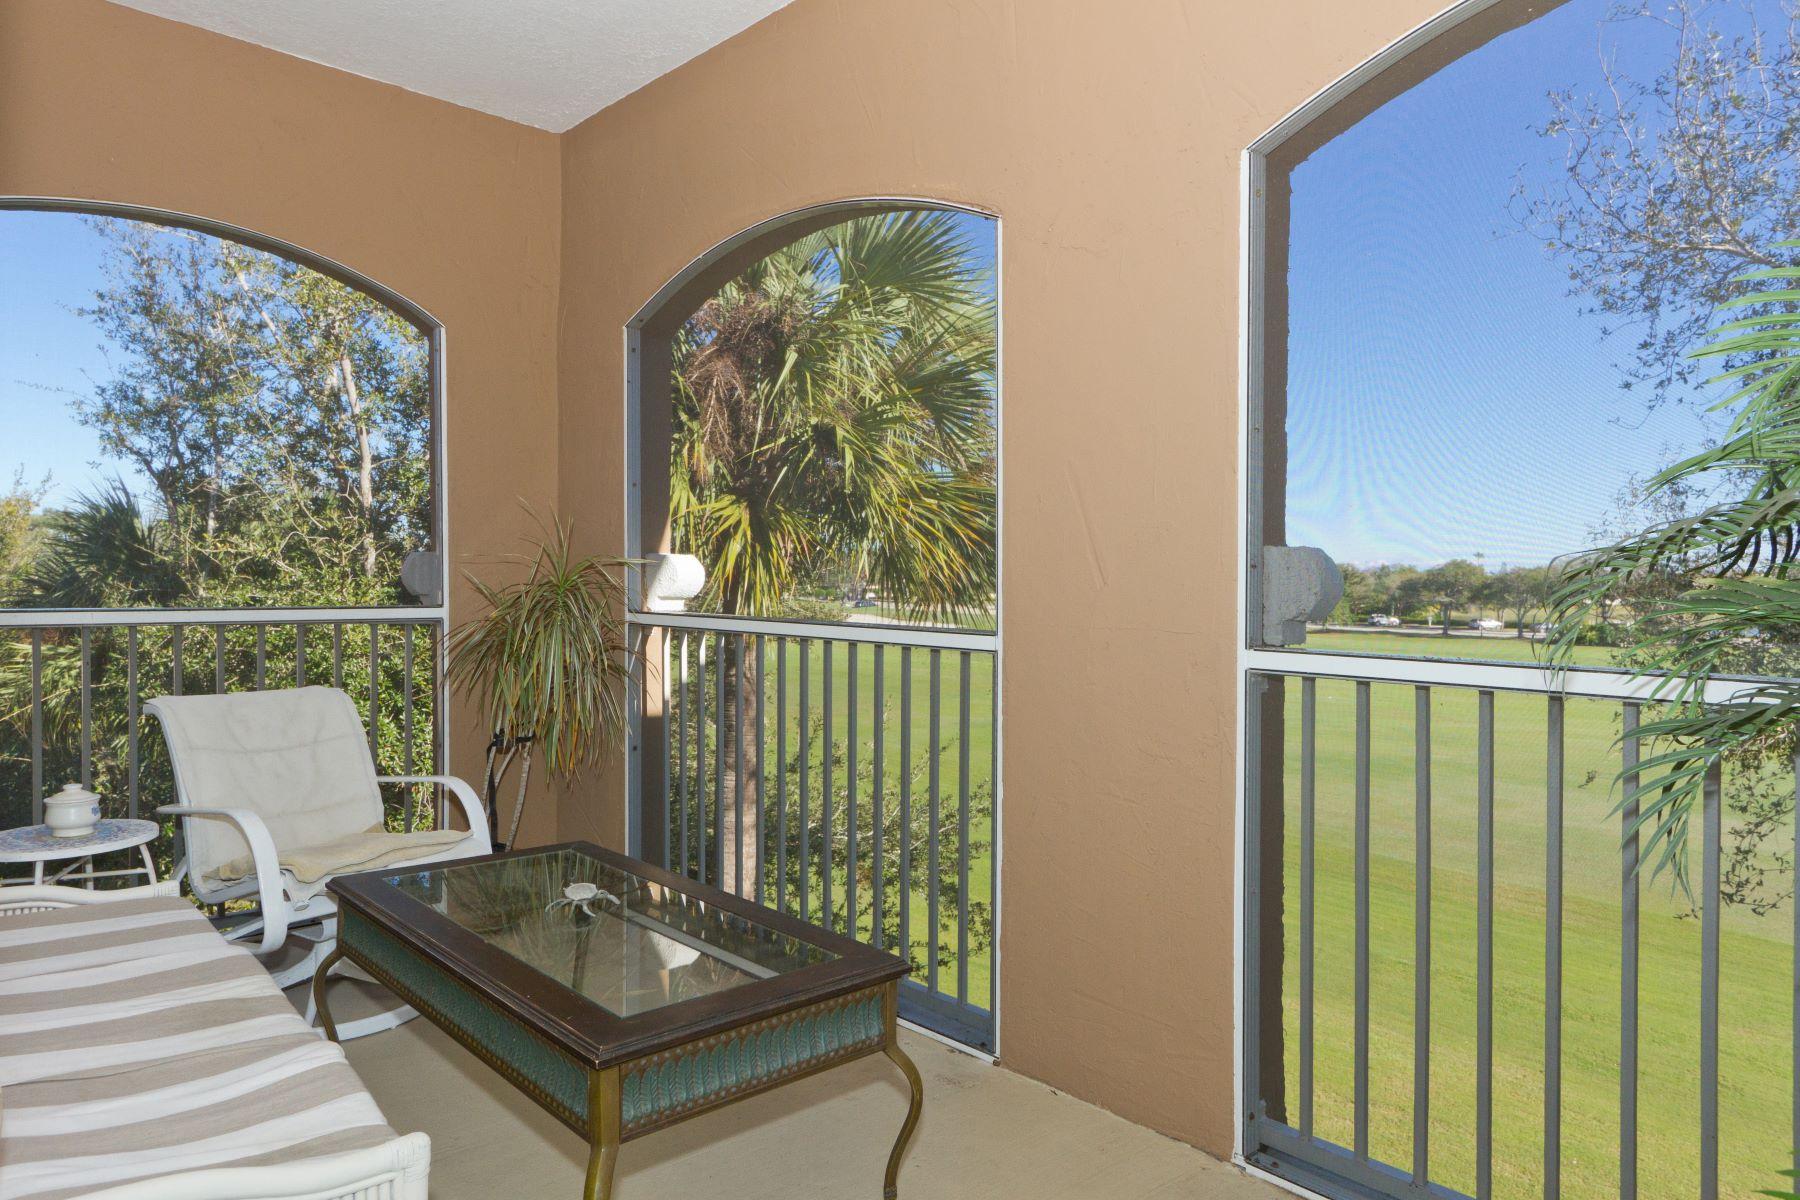 Third Floor Condo with Breezy Screened Porch! 5025 Fairways Circle B303 Vero Beach, Florida 32967 Hoa Kỳ